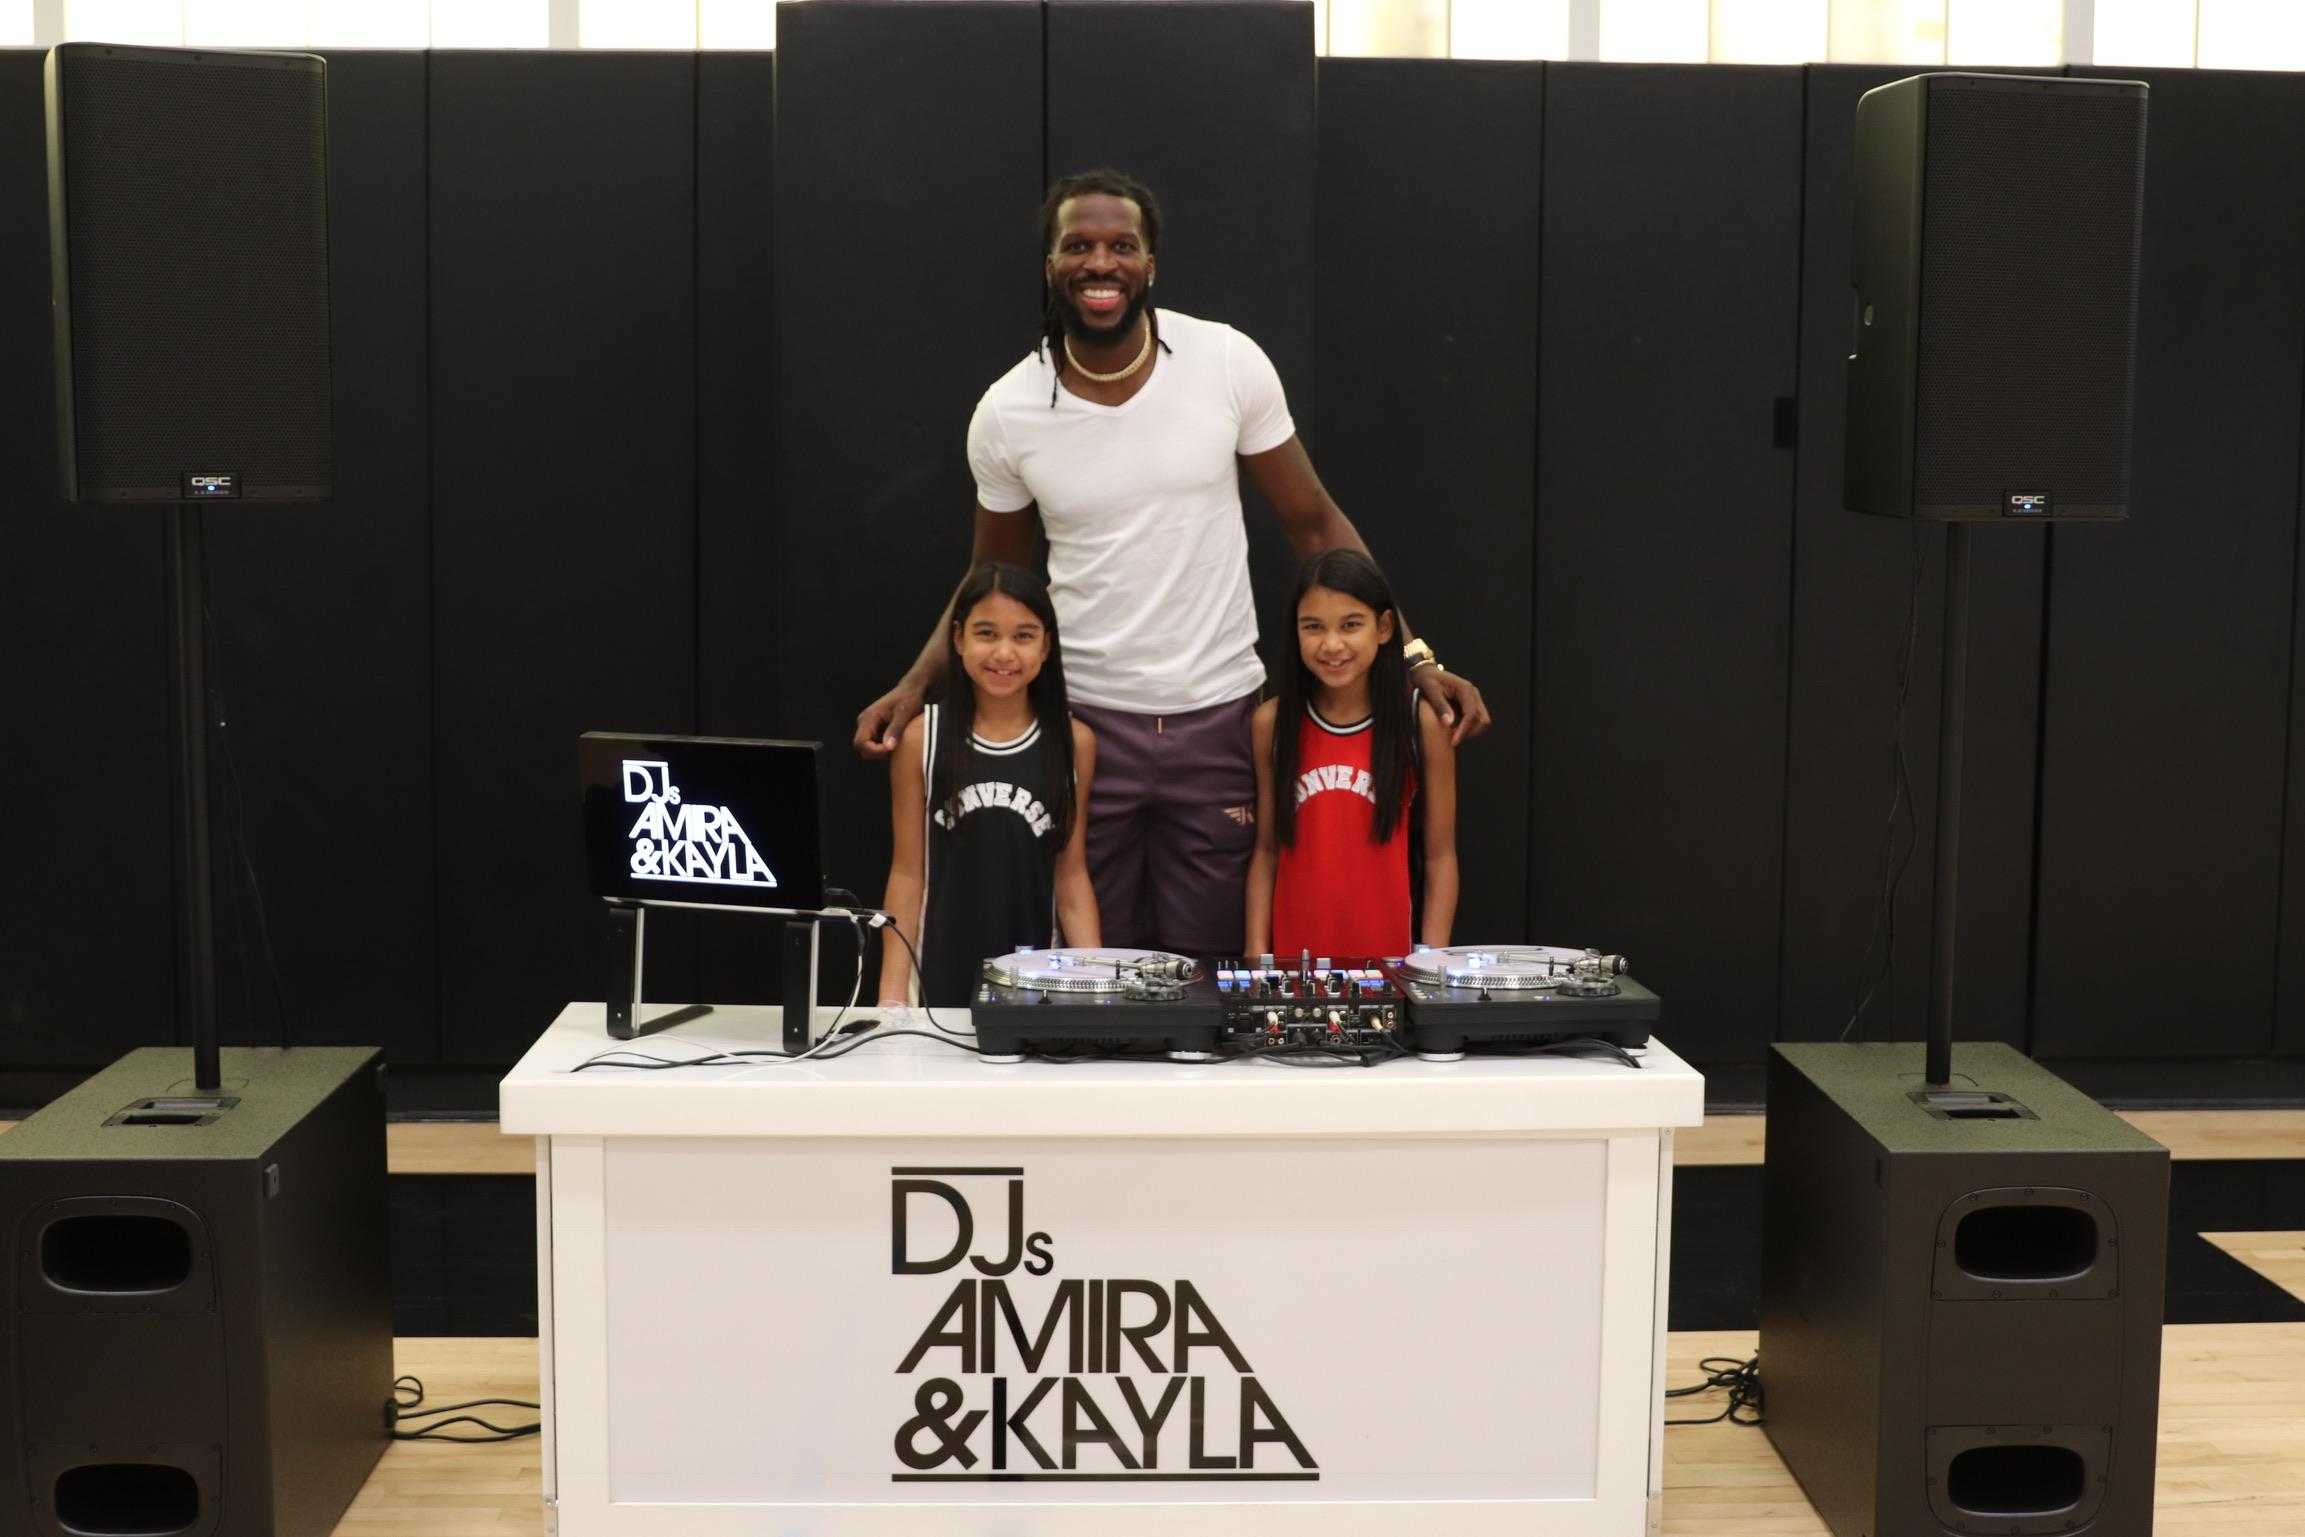 DeMarre_Carroll_DJs_Amira_Kayla_girls_basketball_clinic.JPG